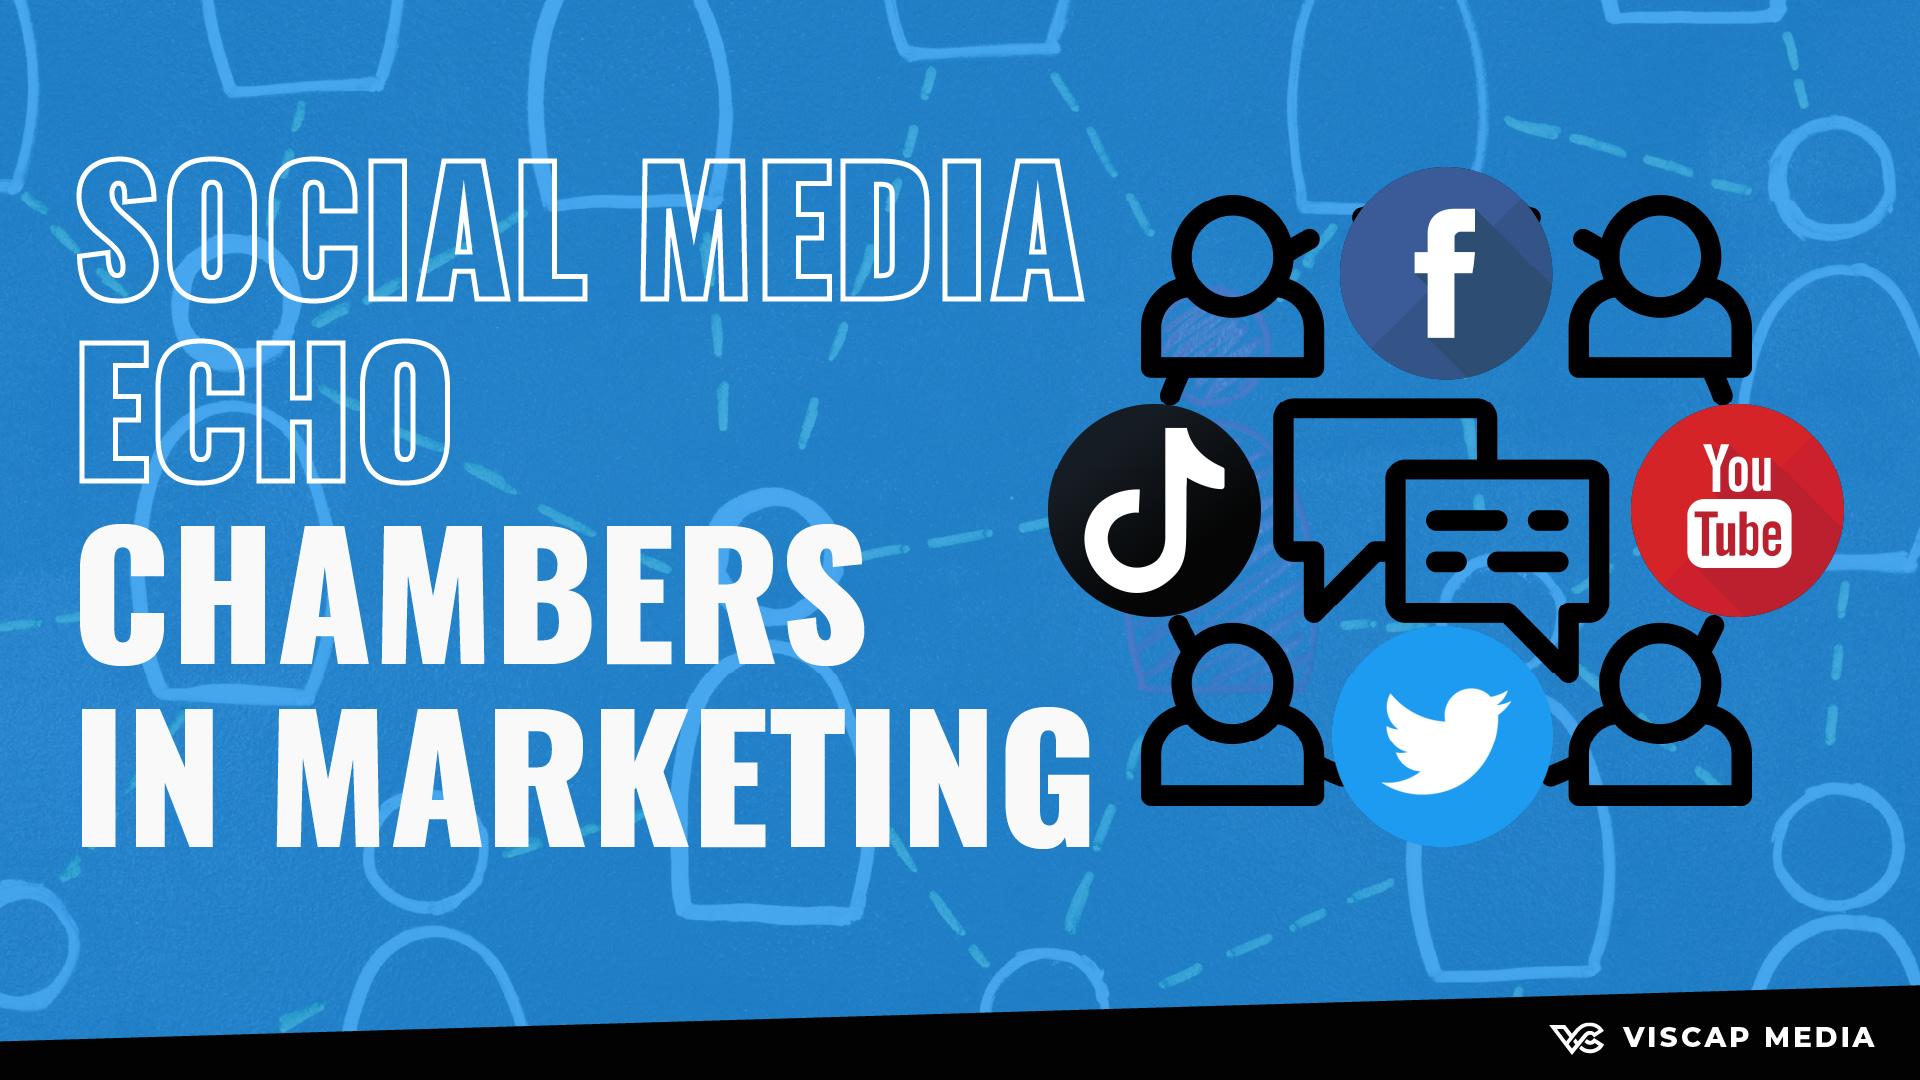 Social Media Echo Chambers in Marketing Thumbnail